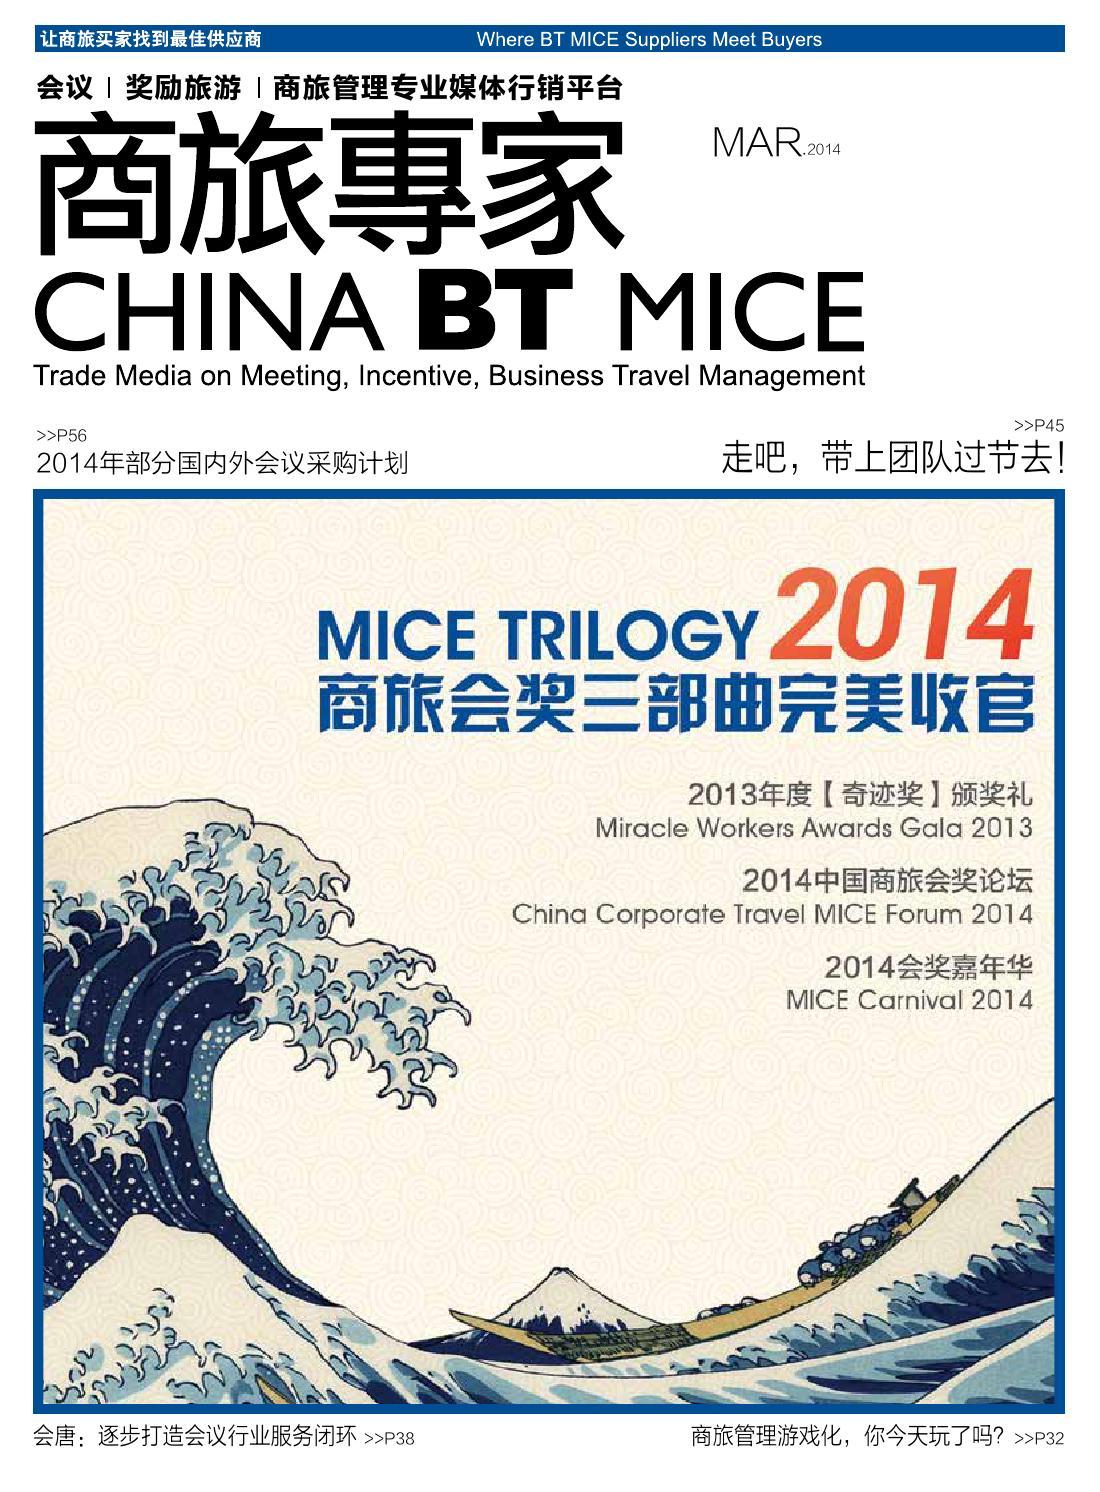 China BT MICE MAR 2014 by Rebecca Bi - issuu巴哈哈拉